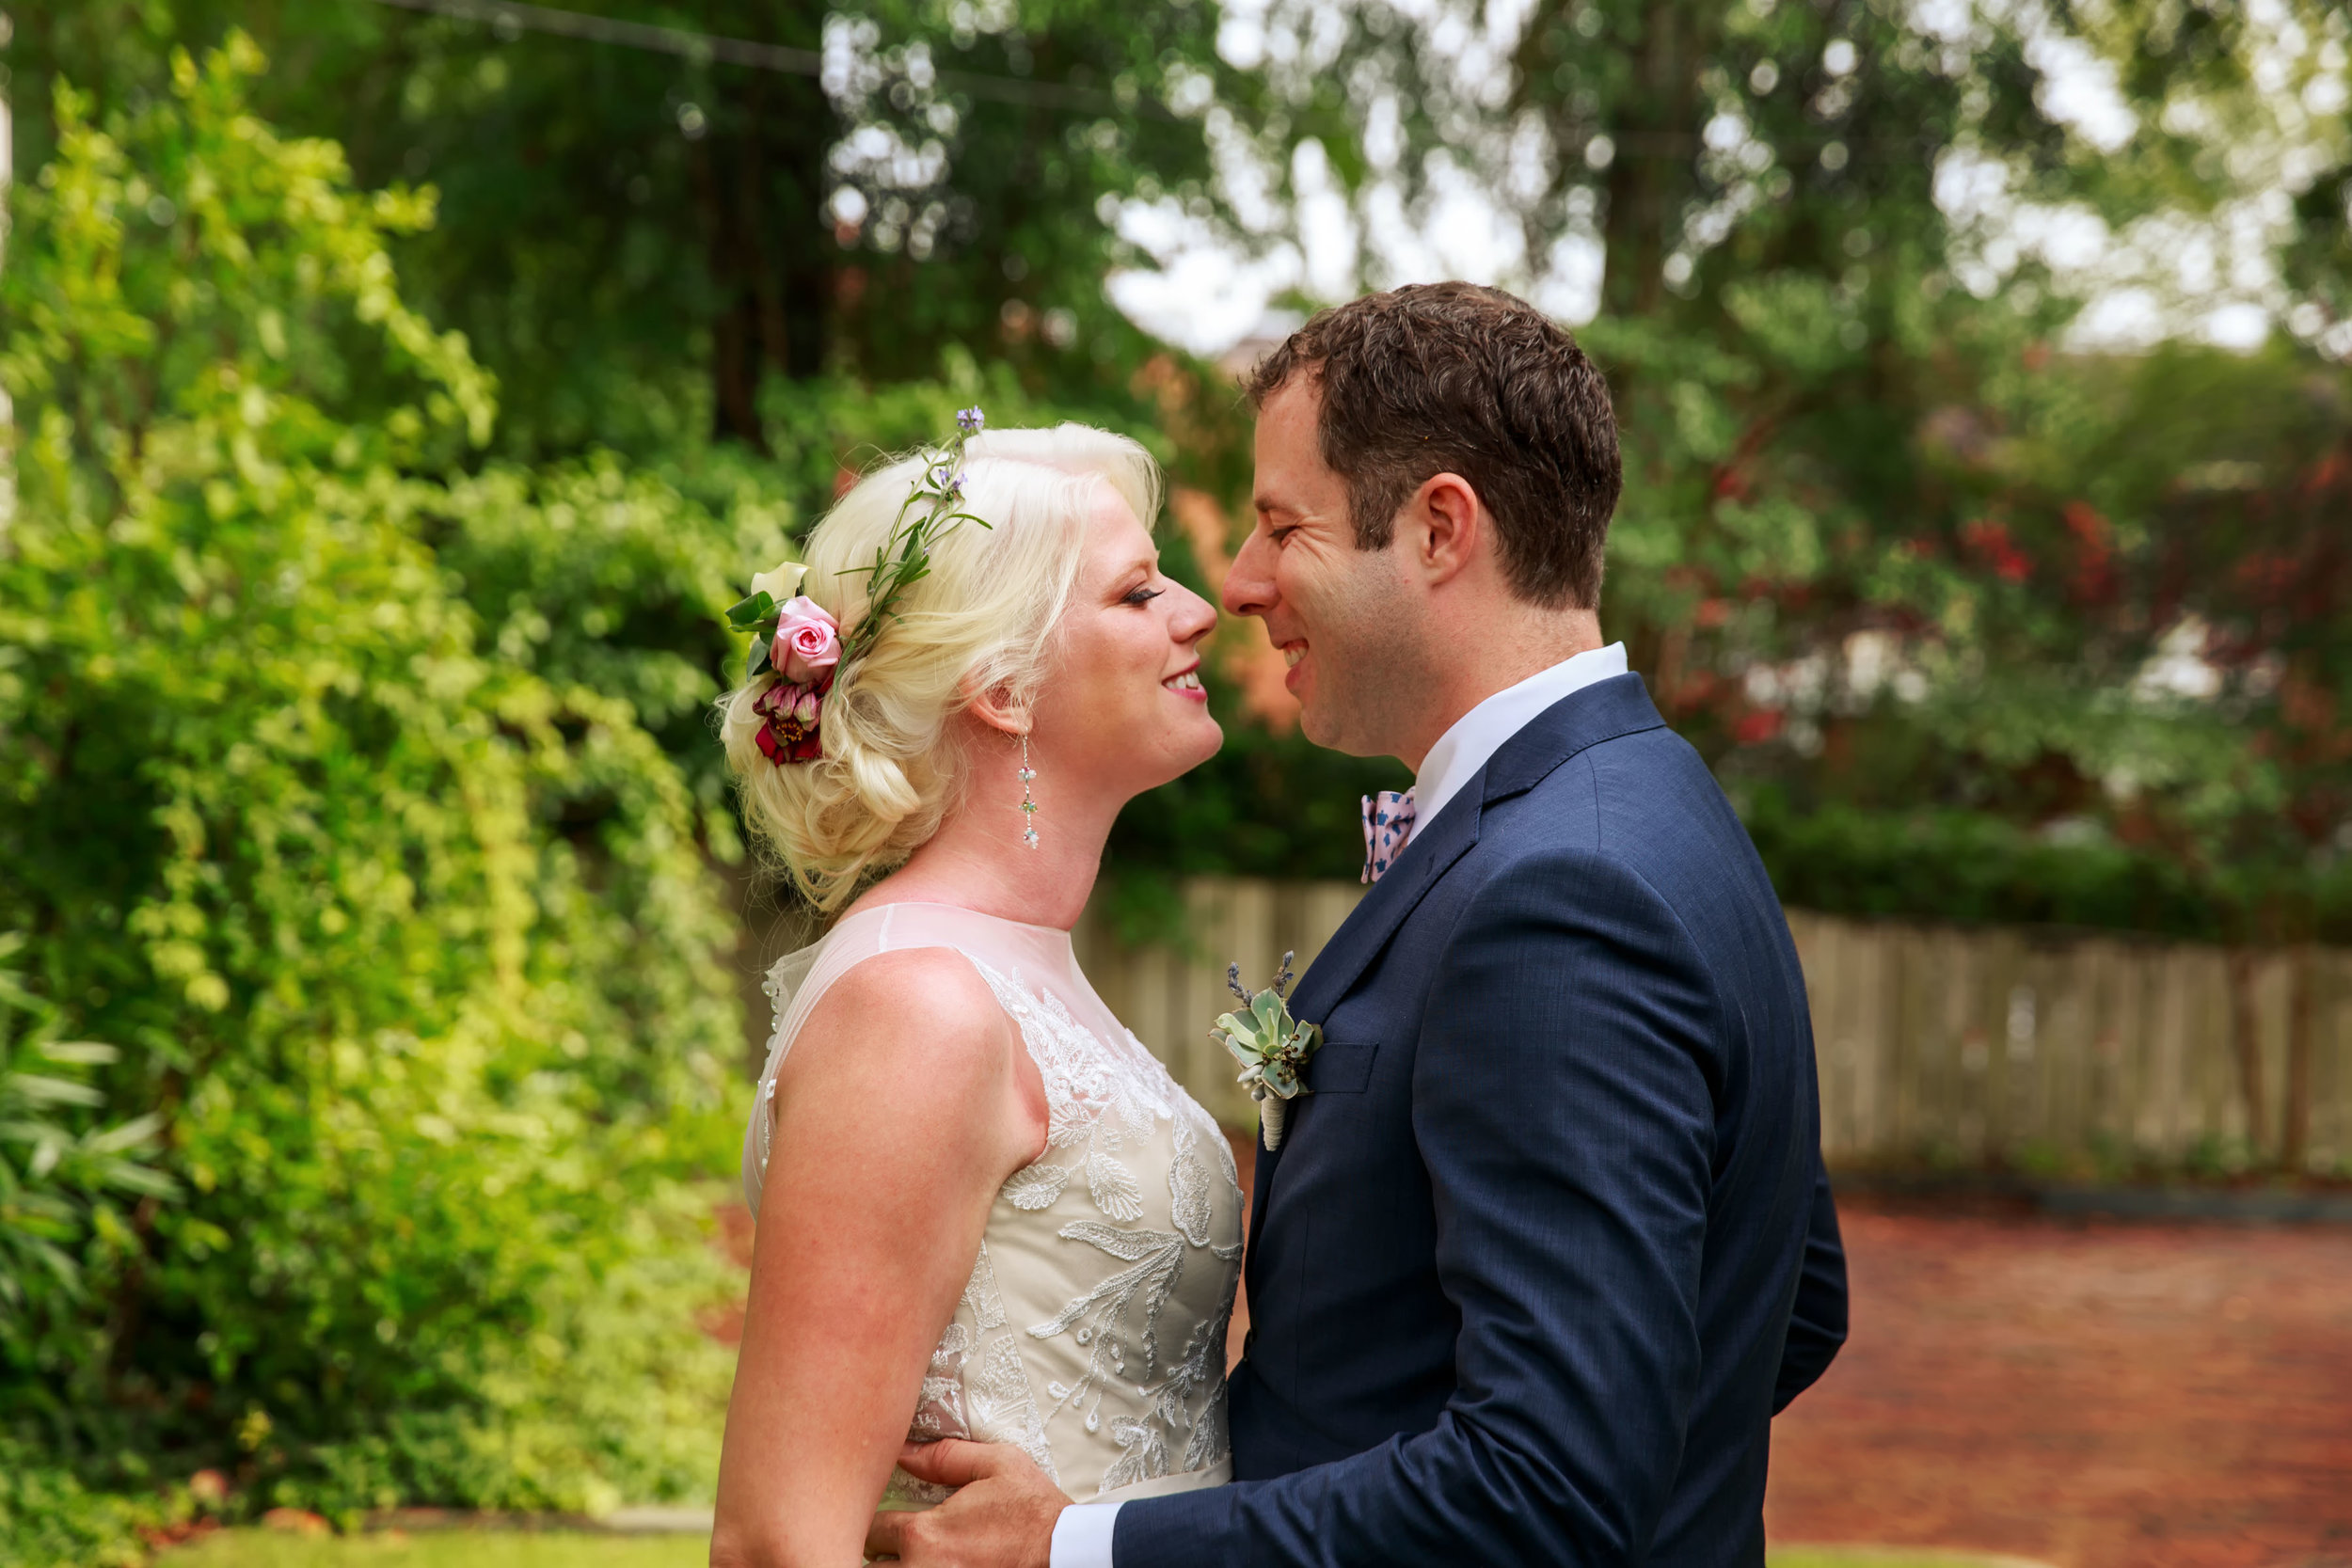 128-South-Wedding-Tiffany-Abruzzo-Photography-Bride-&-Groom-27.jpg